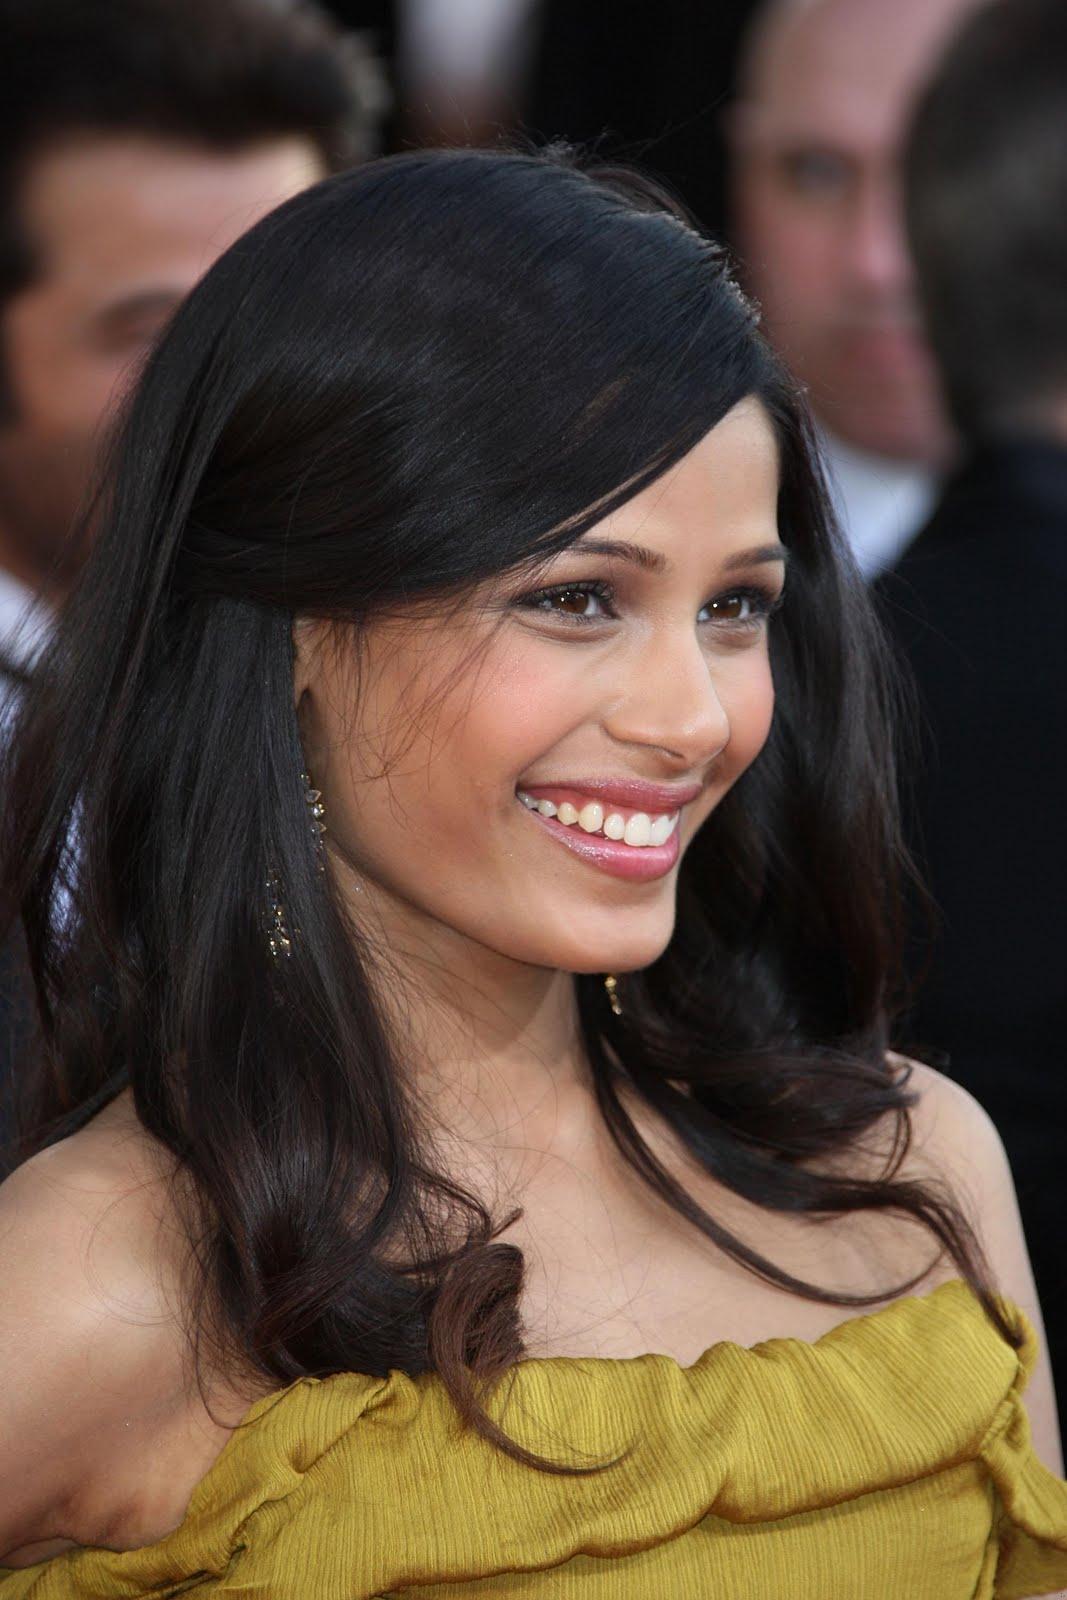 http://1.bp.blogspot.com/-J0n3Cg1M7wA/TyBk9M9SNpI/AAAAAAAAN0Y/oR4wkTgXGmc/s1600/Freida_Pinto_hd_pictures_hair_style.jpg